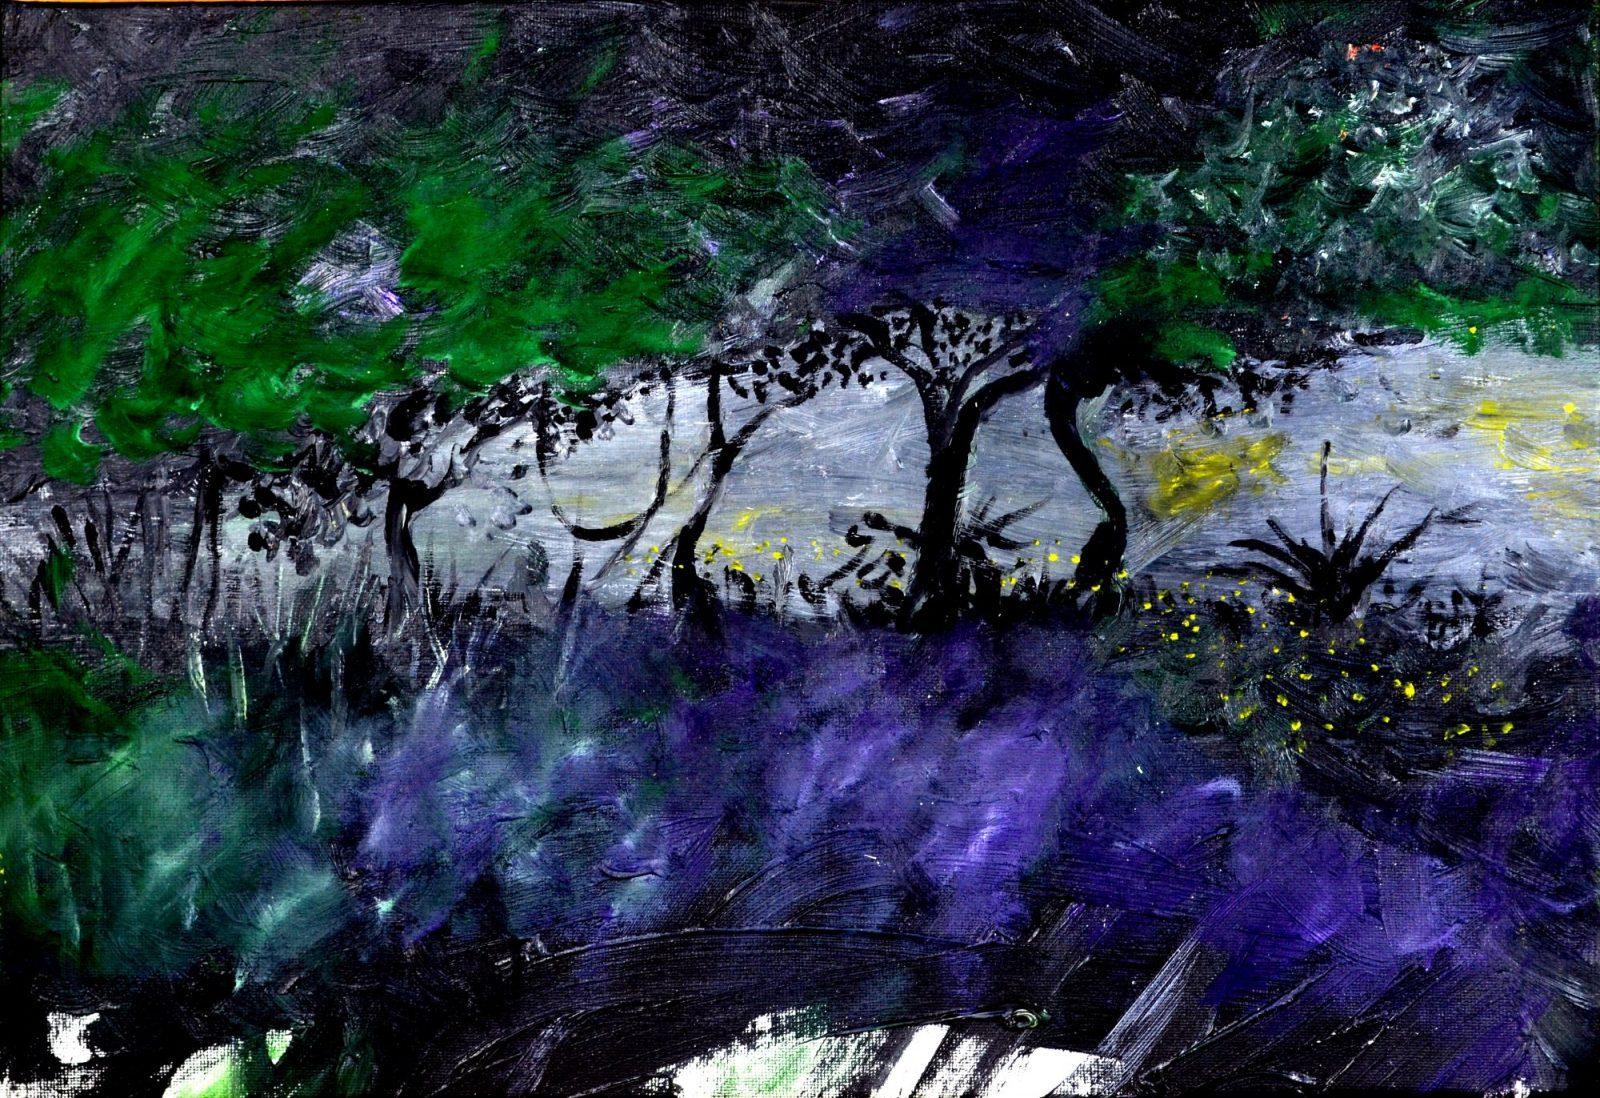 franyo aatoth: Garden Series 26.